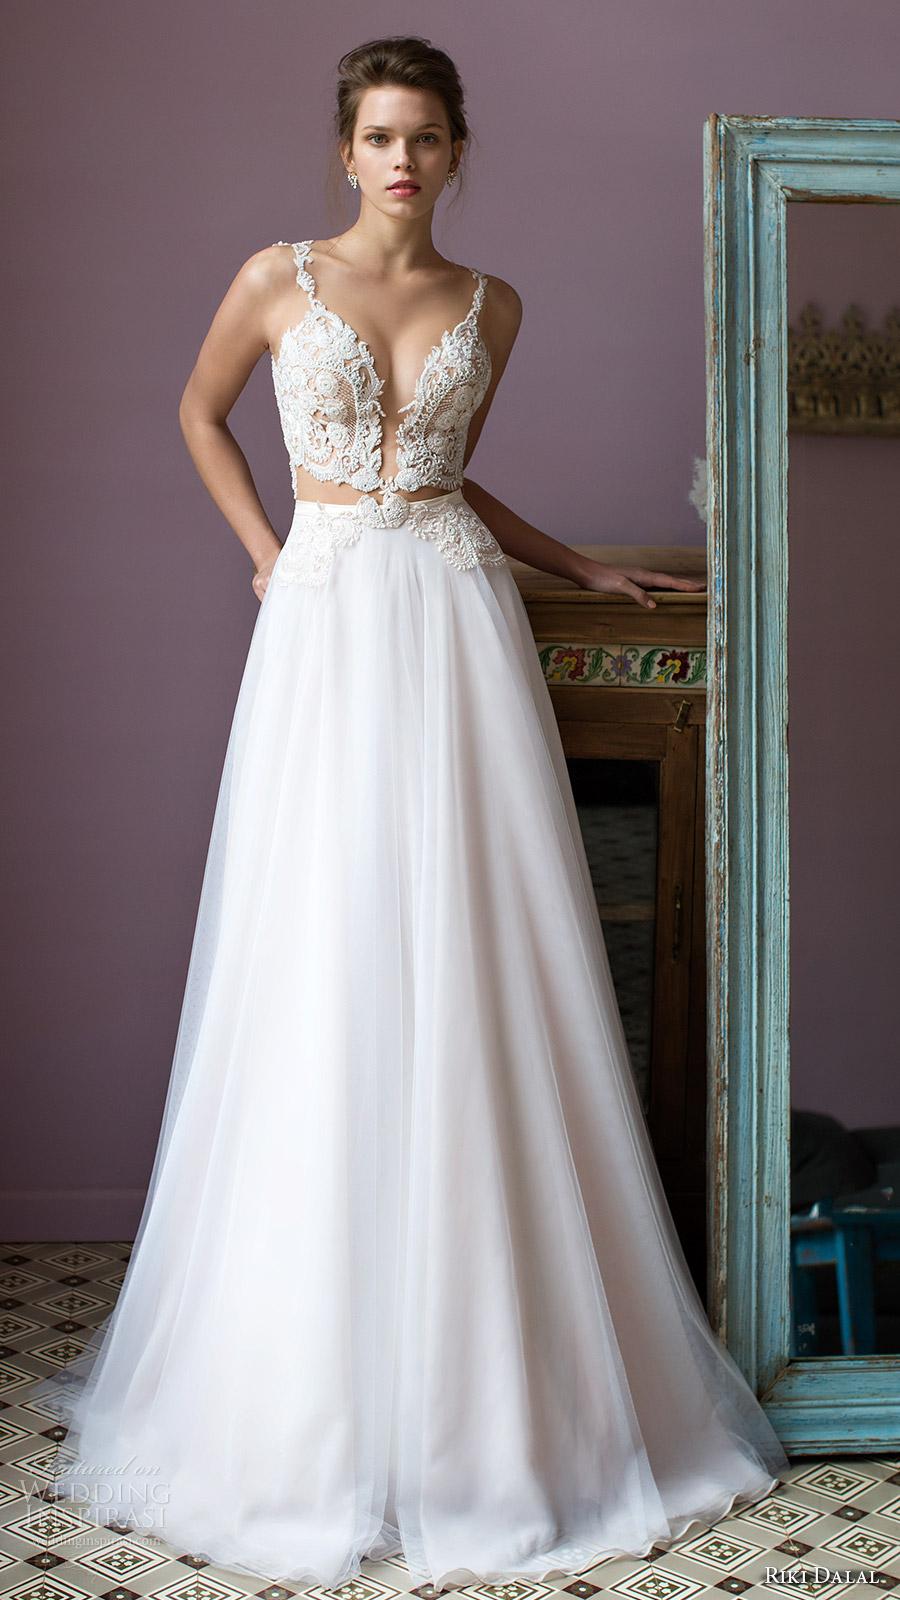 riki dalal bridal 2016 sleeveless plunging sweetheart lace bodice a line wedding dress (1805) mv sexy romantic